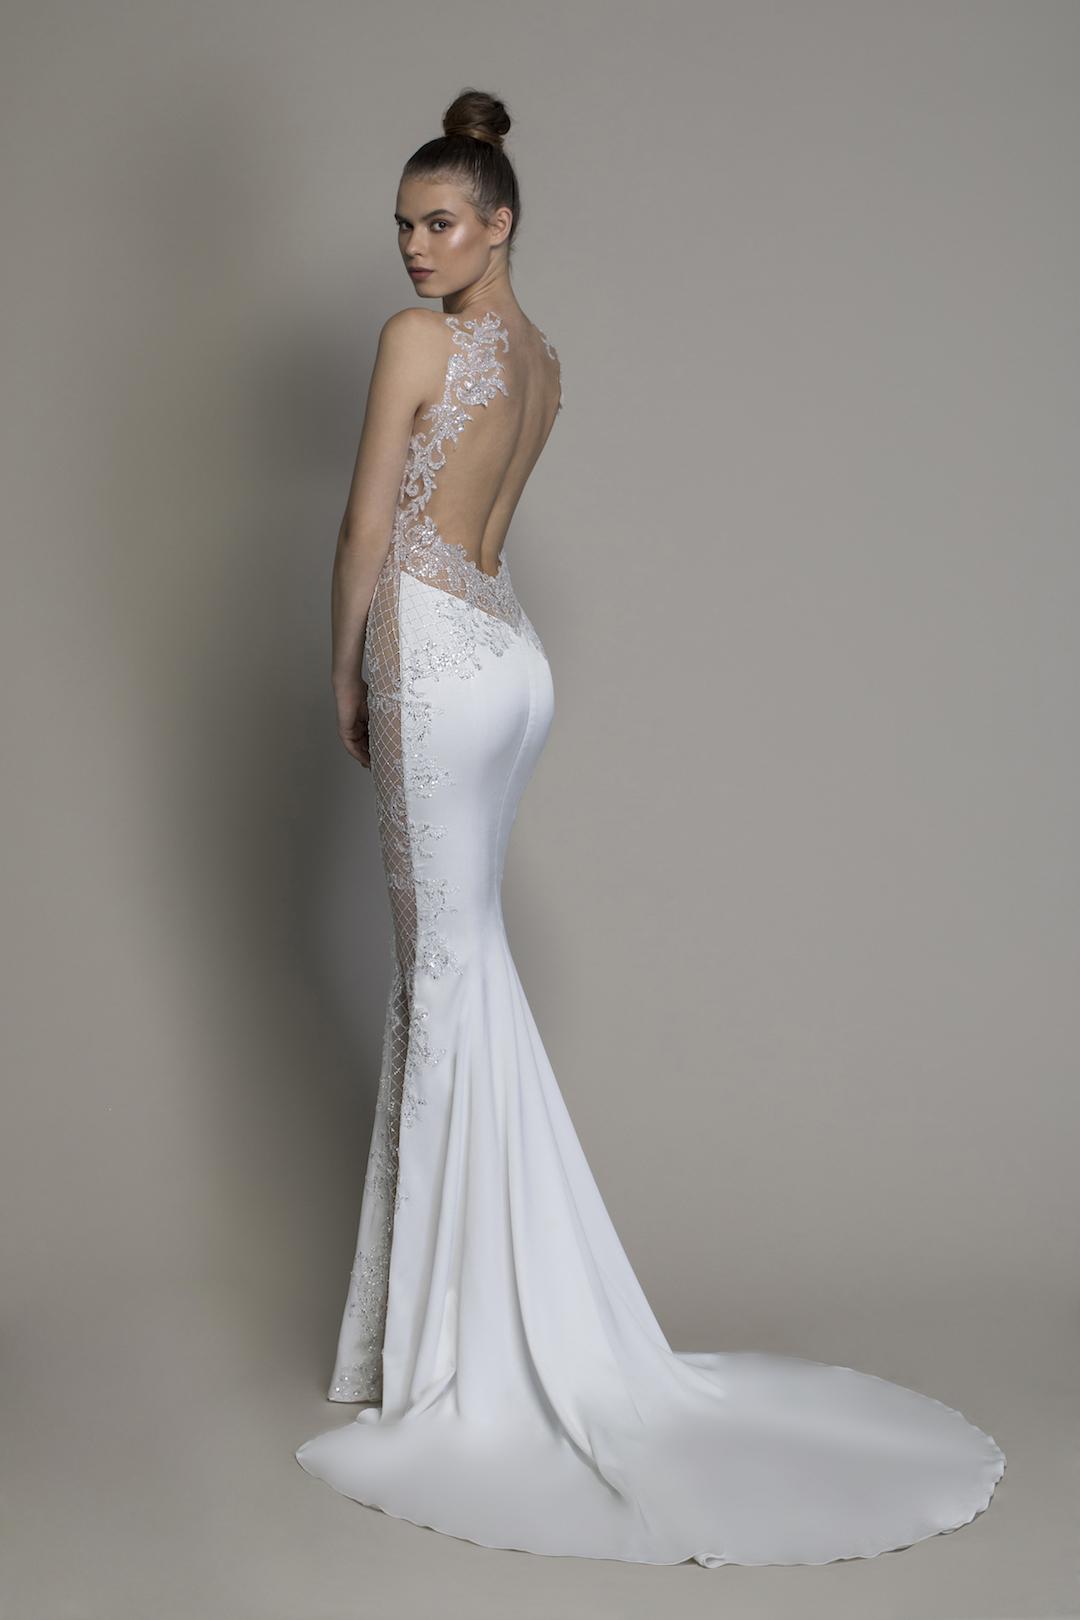 Crepe Sheath Wedding Dress With Sheer Micro Sequin Lattice